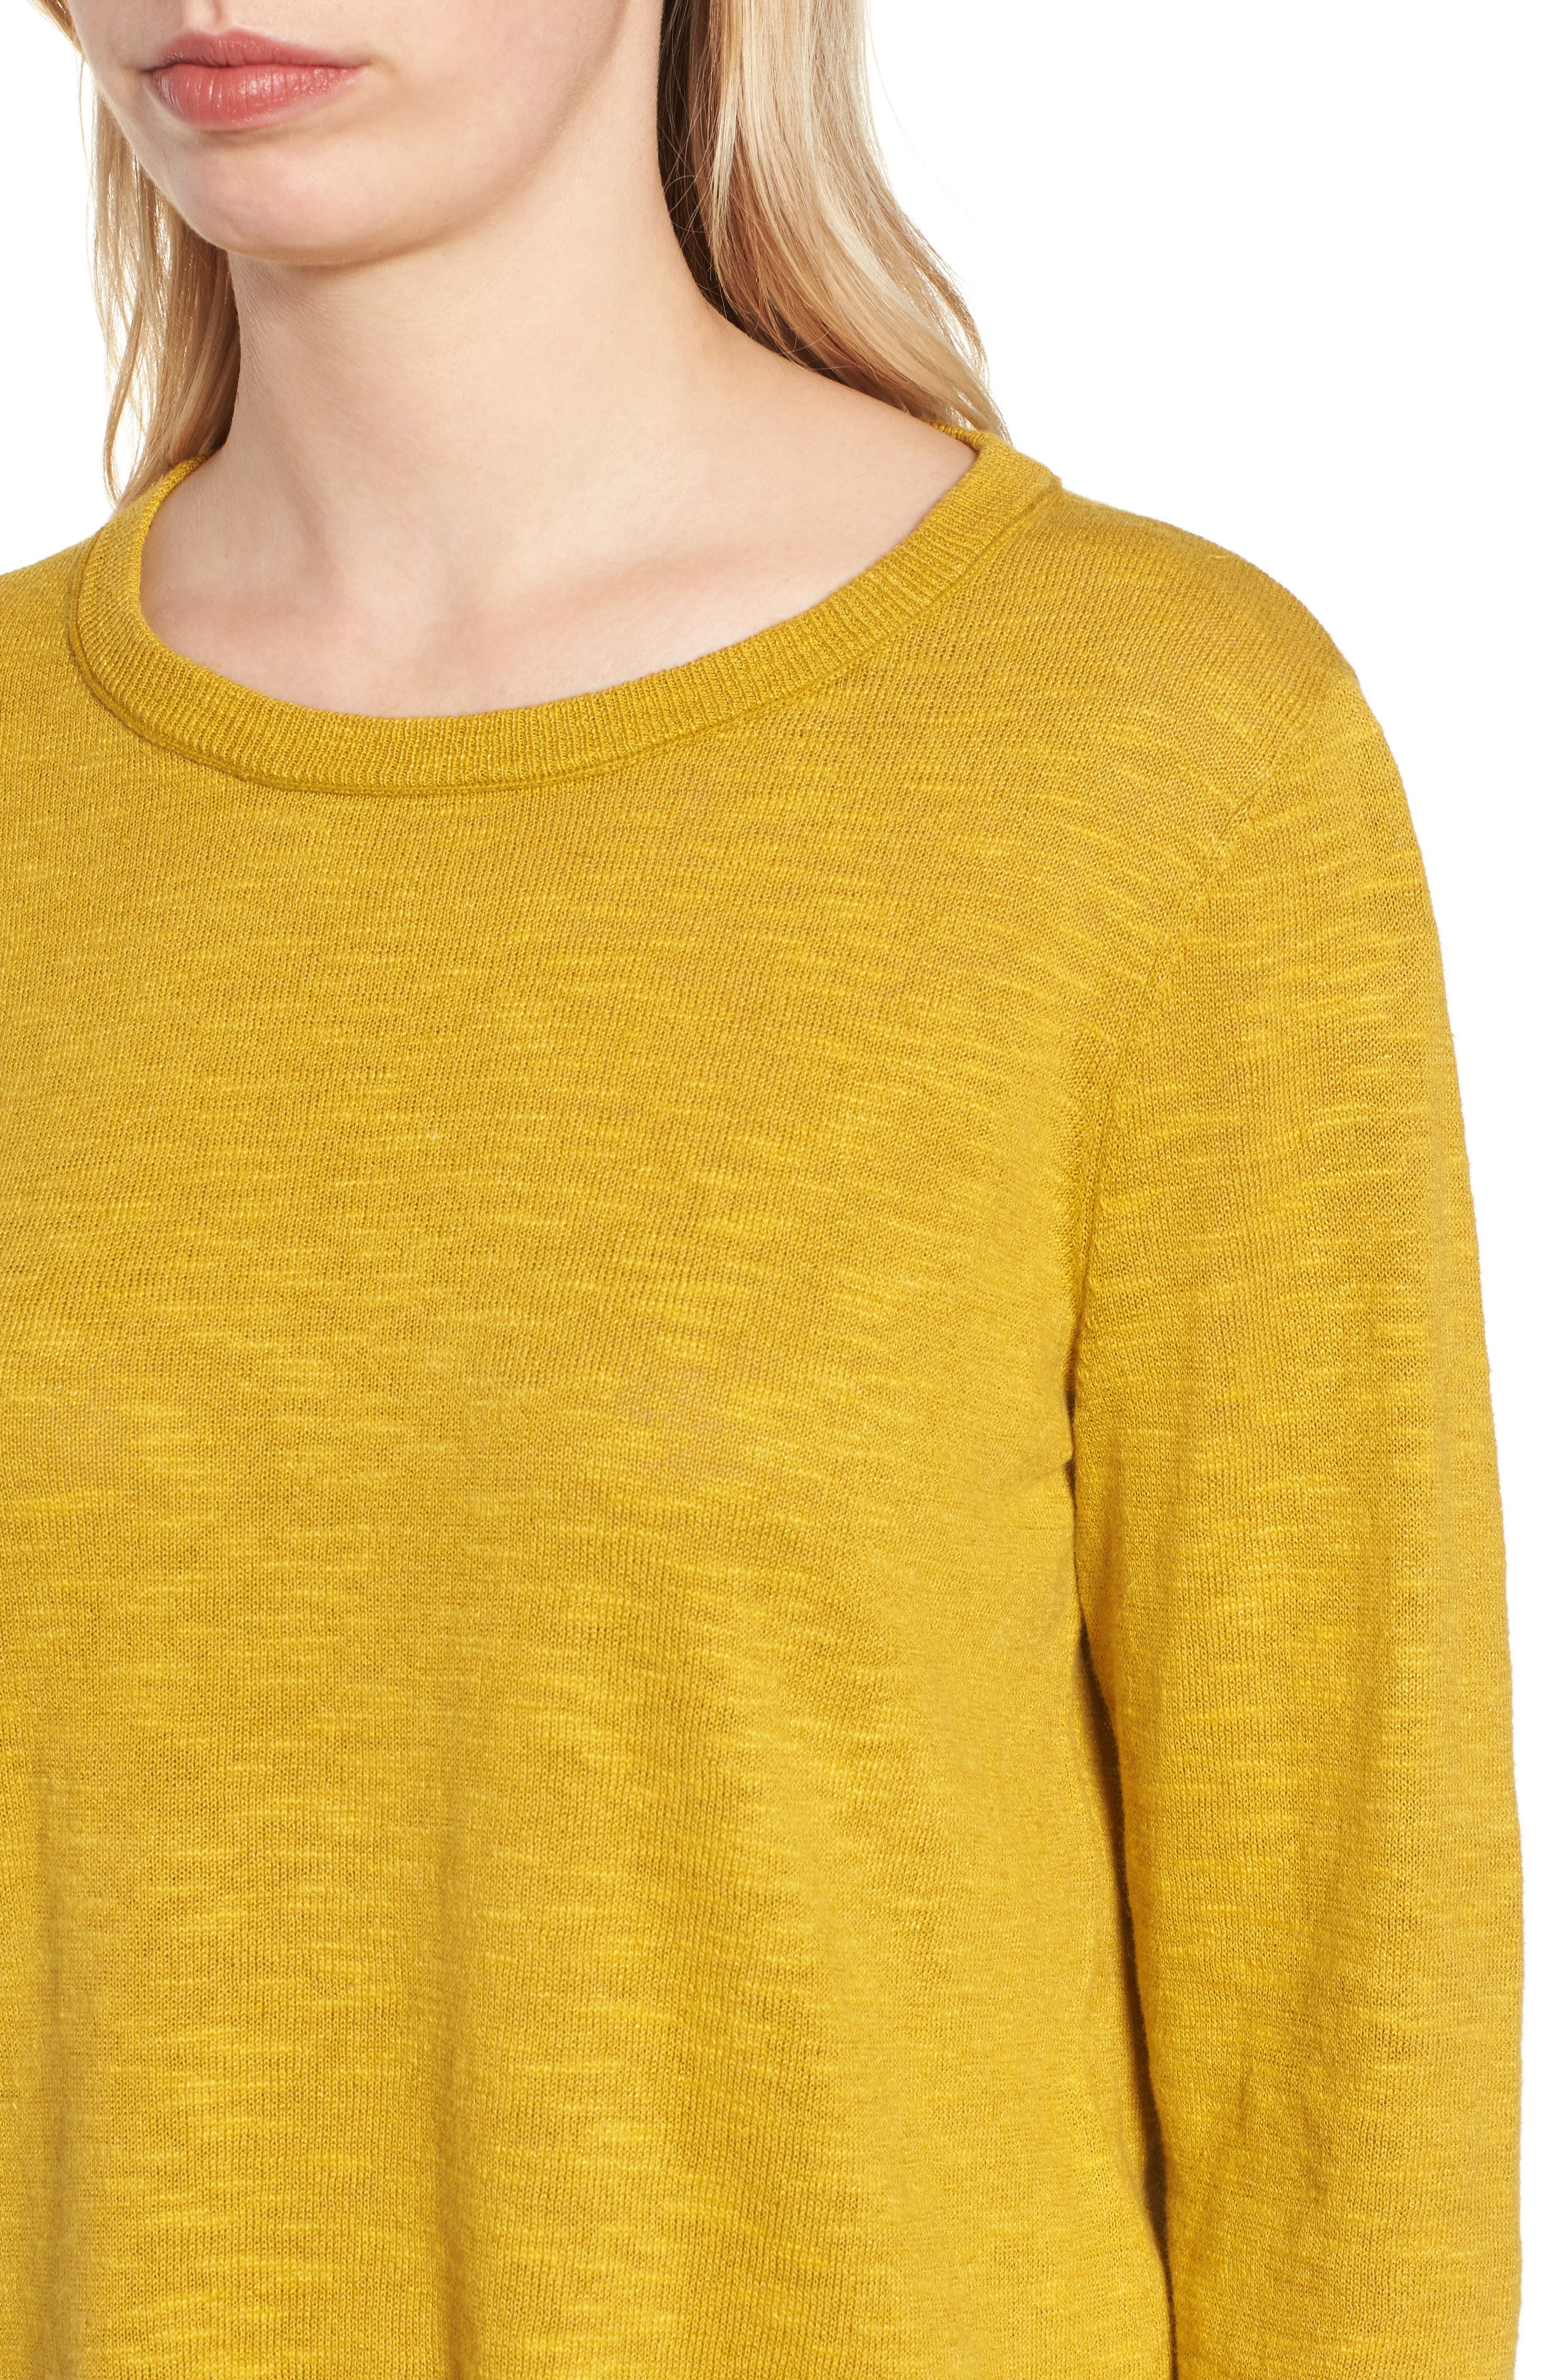 Organic Knit Crewneck Tunic Top,                             Alternate thumbnail 4, color,                             Mustard Seed